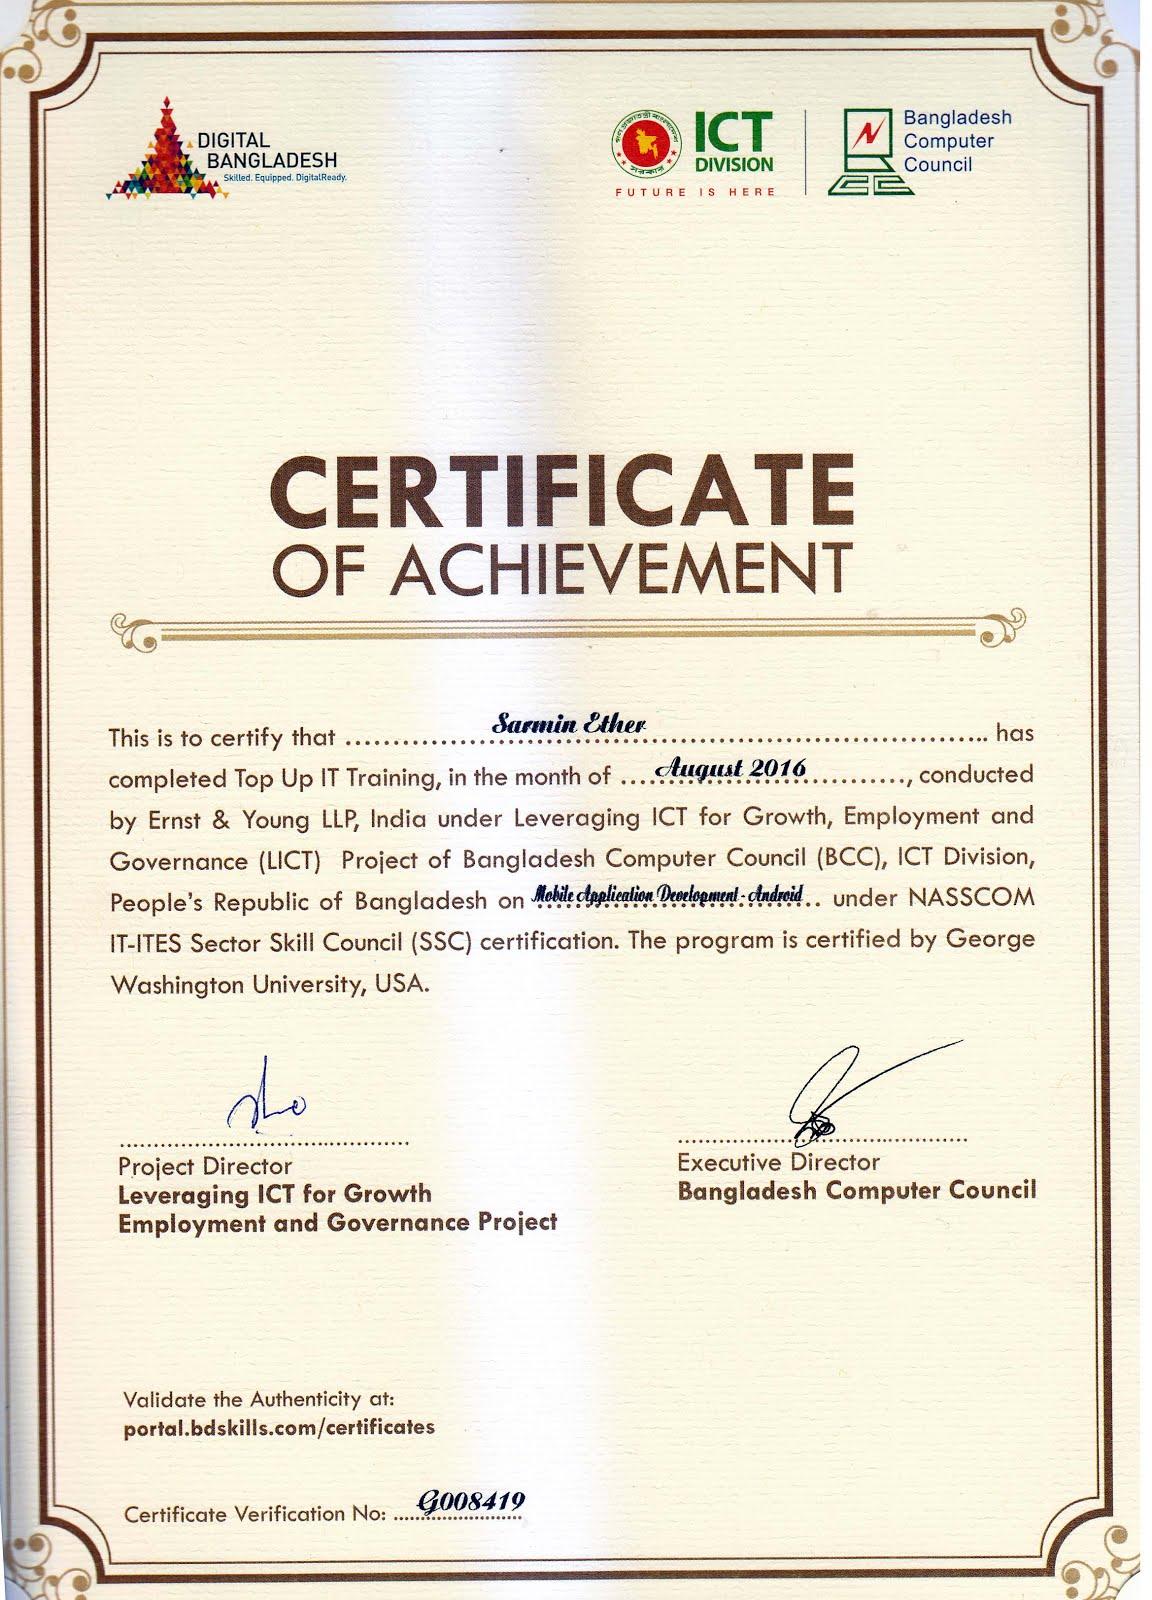 resume of engineer sarmin ether  resume of engr  sarmin